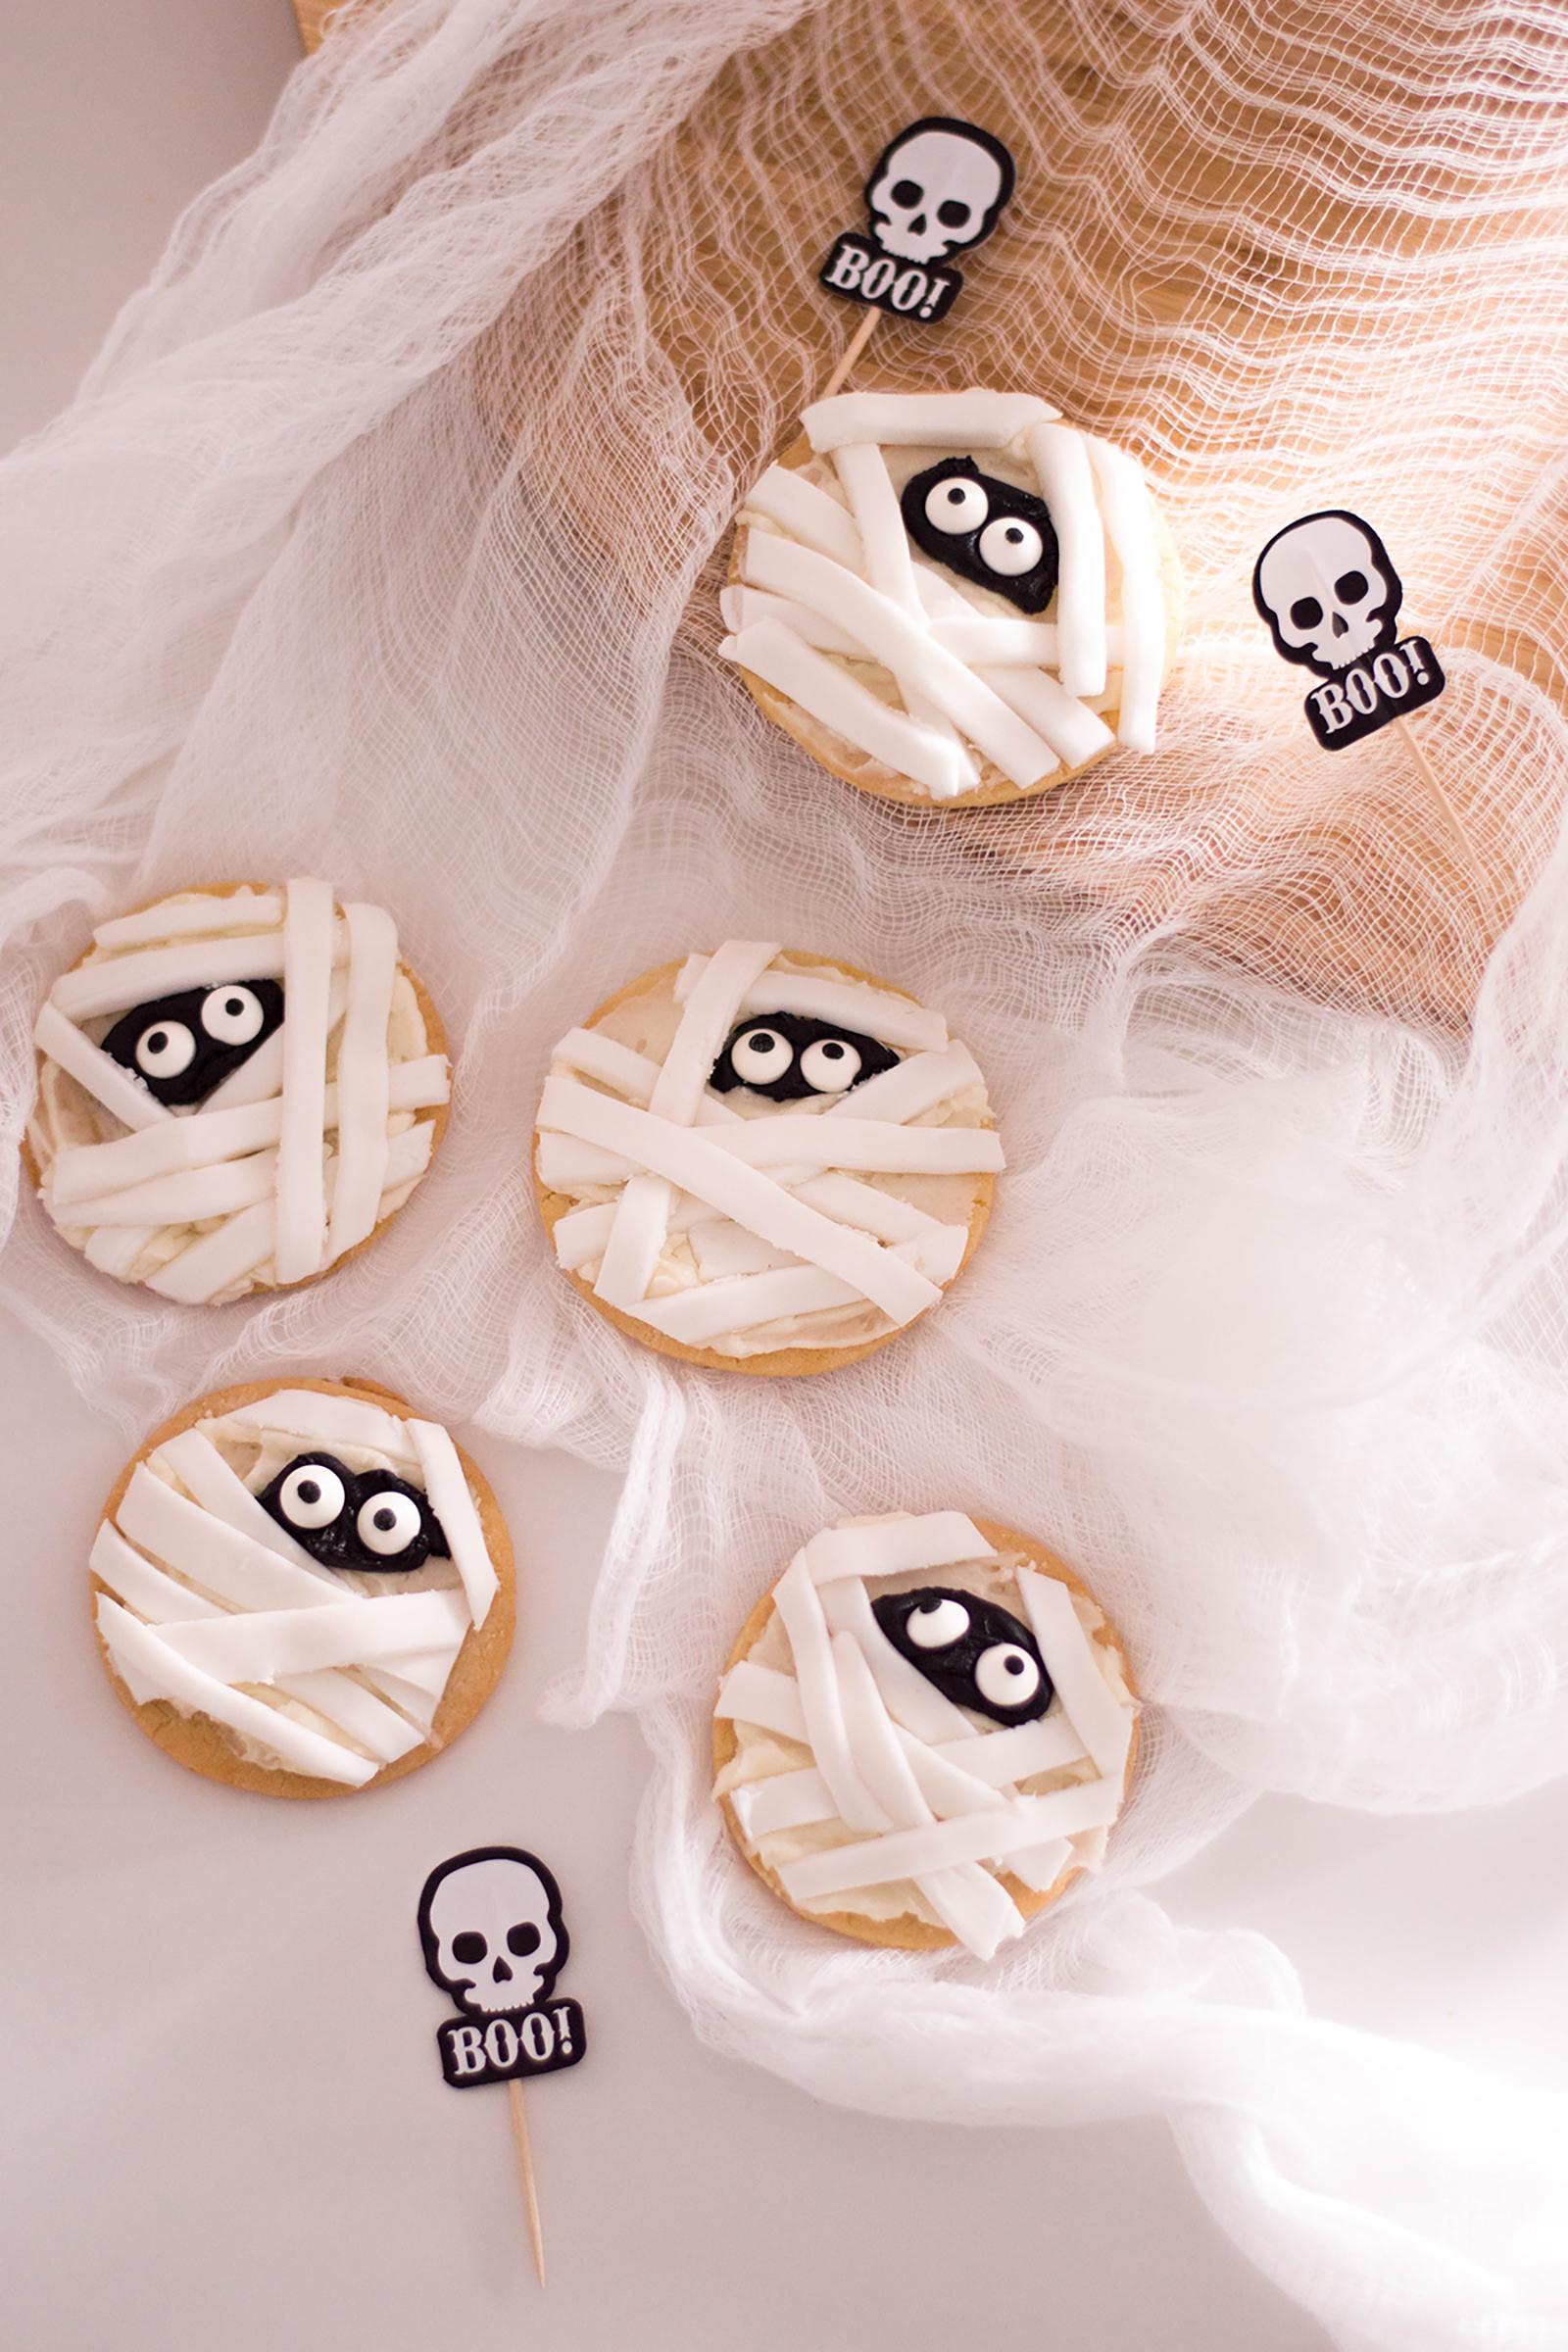 Mummy Sugar Cookies: A Spooky (but Cute!) Halloween Treat